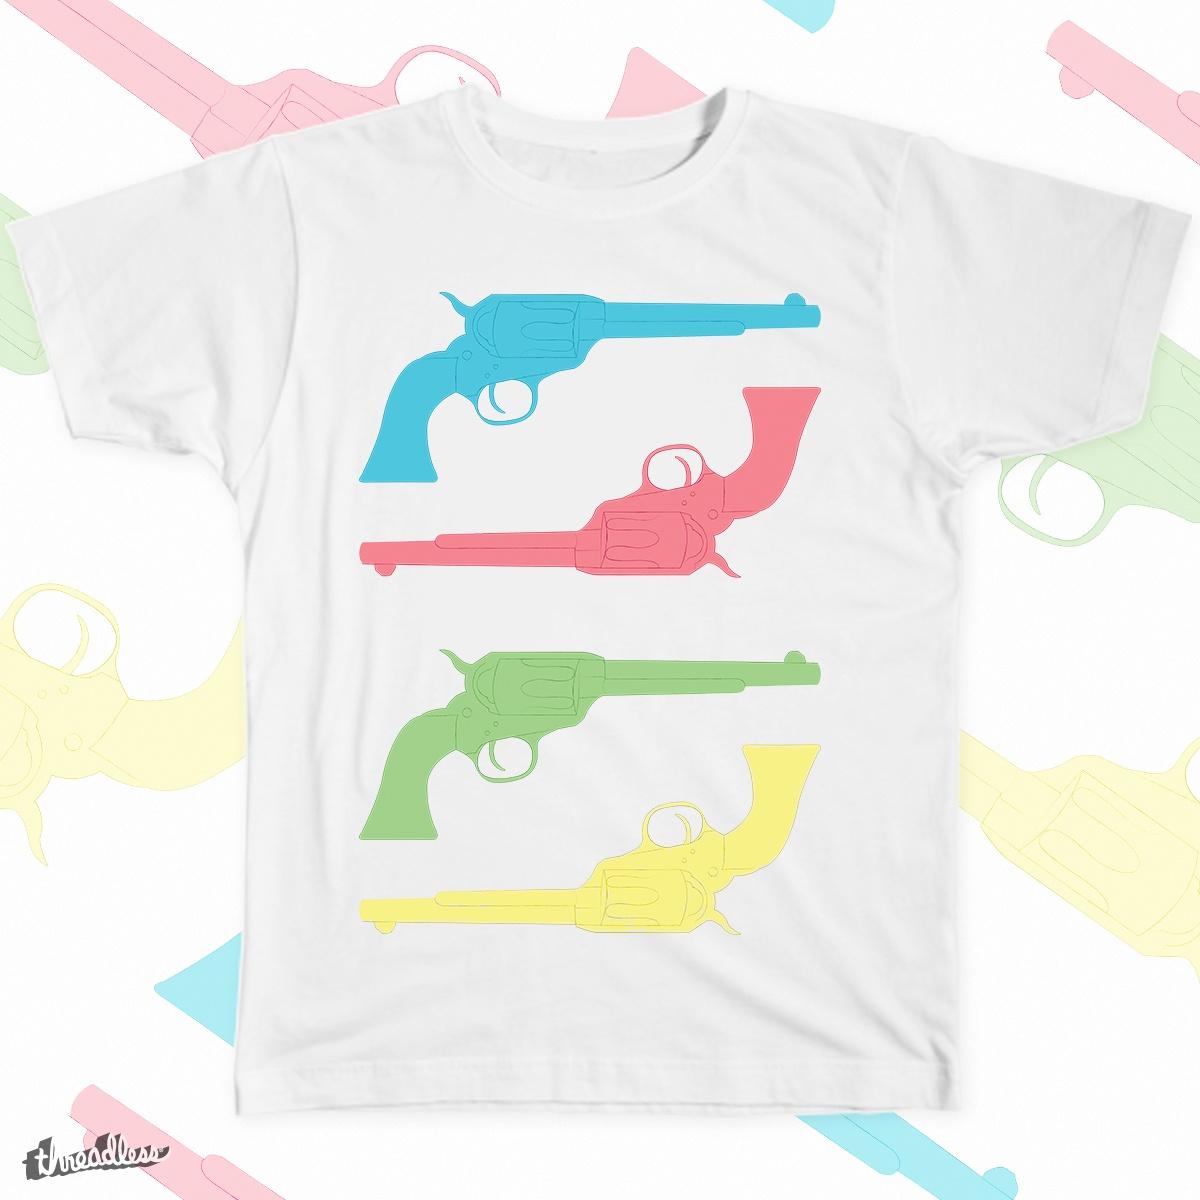 Guns by Krab-Graphix on Threadless